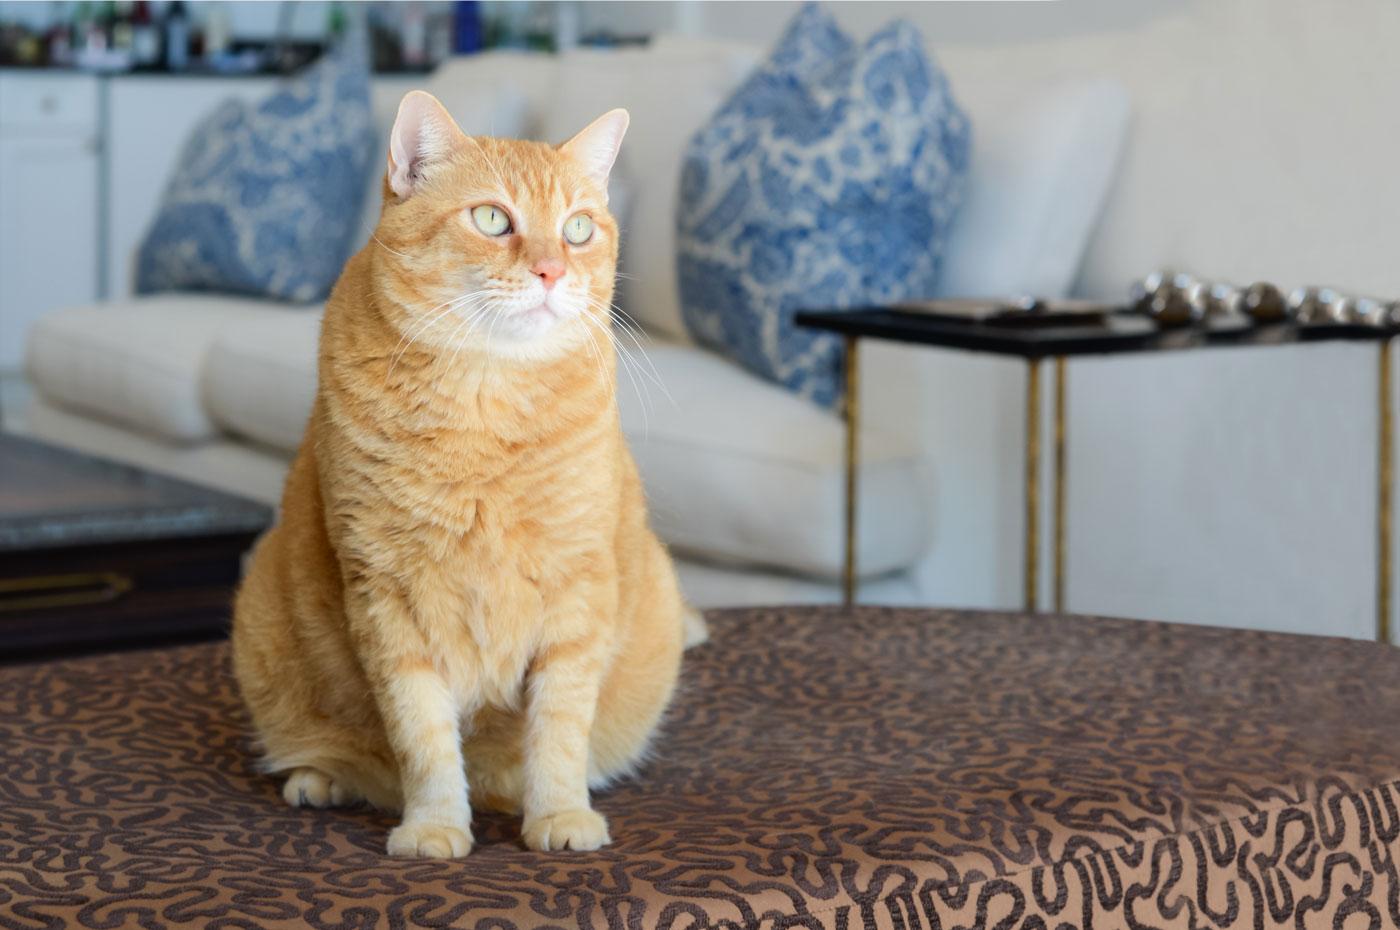 Cat sitting inside